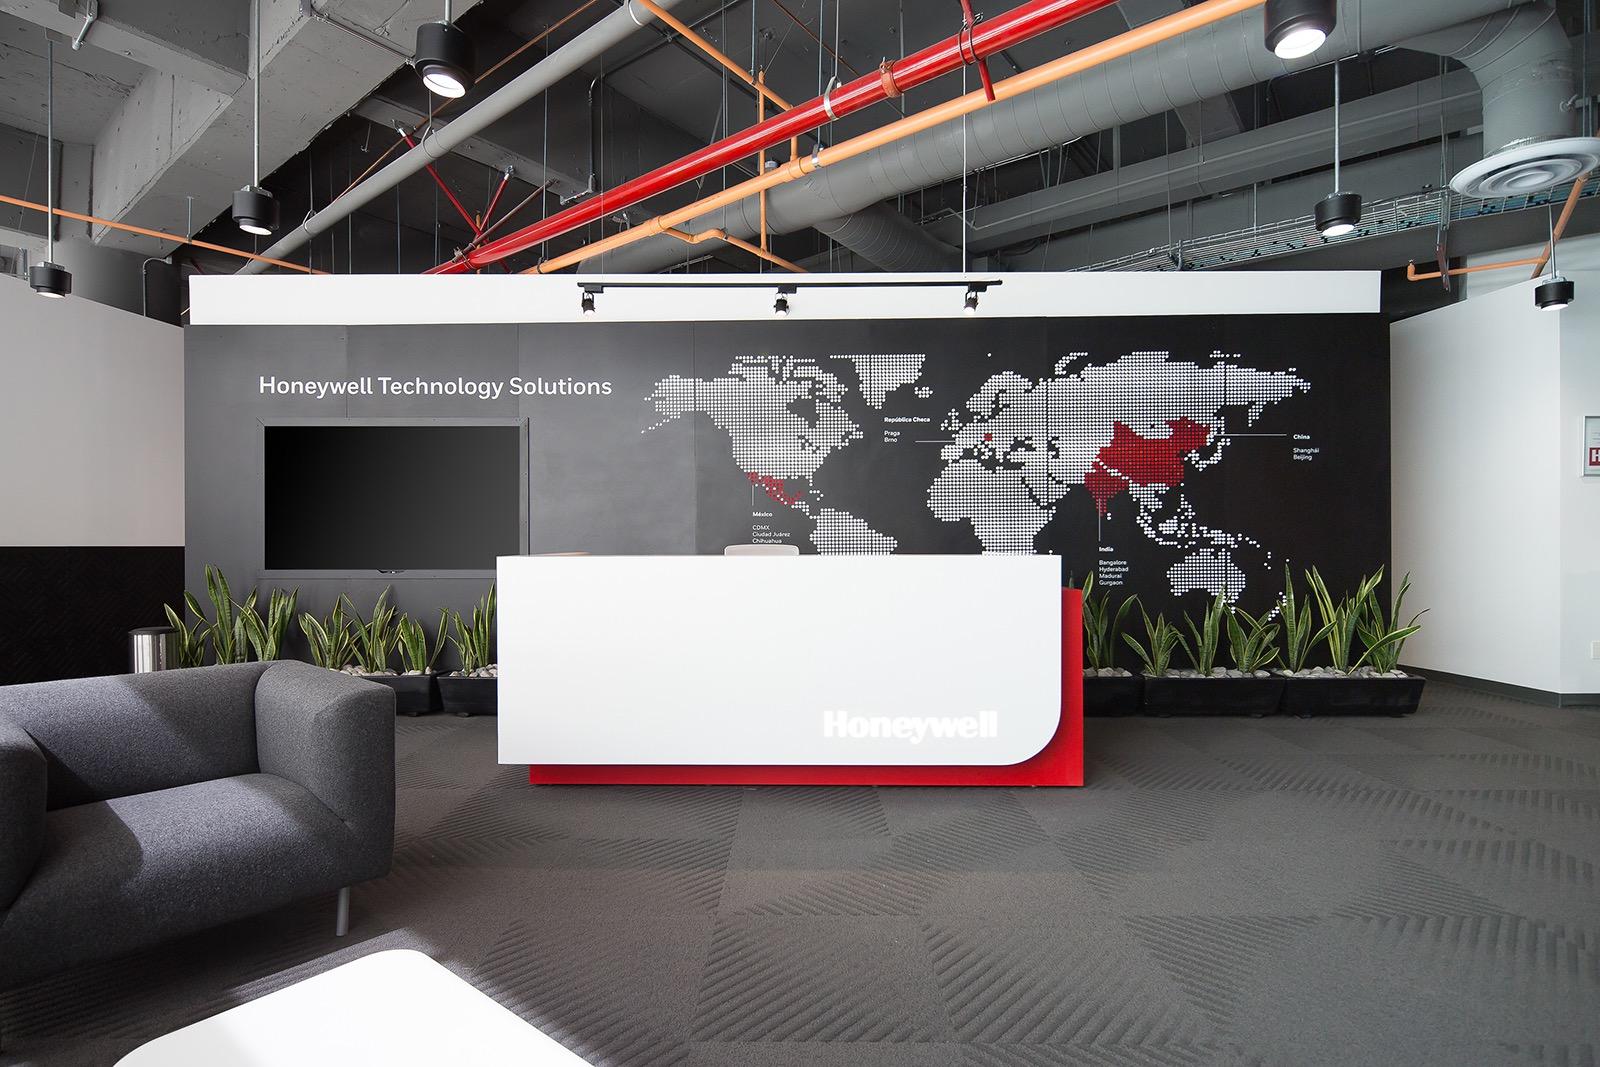 honeywell-technology-solutions-office-9